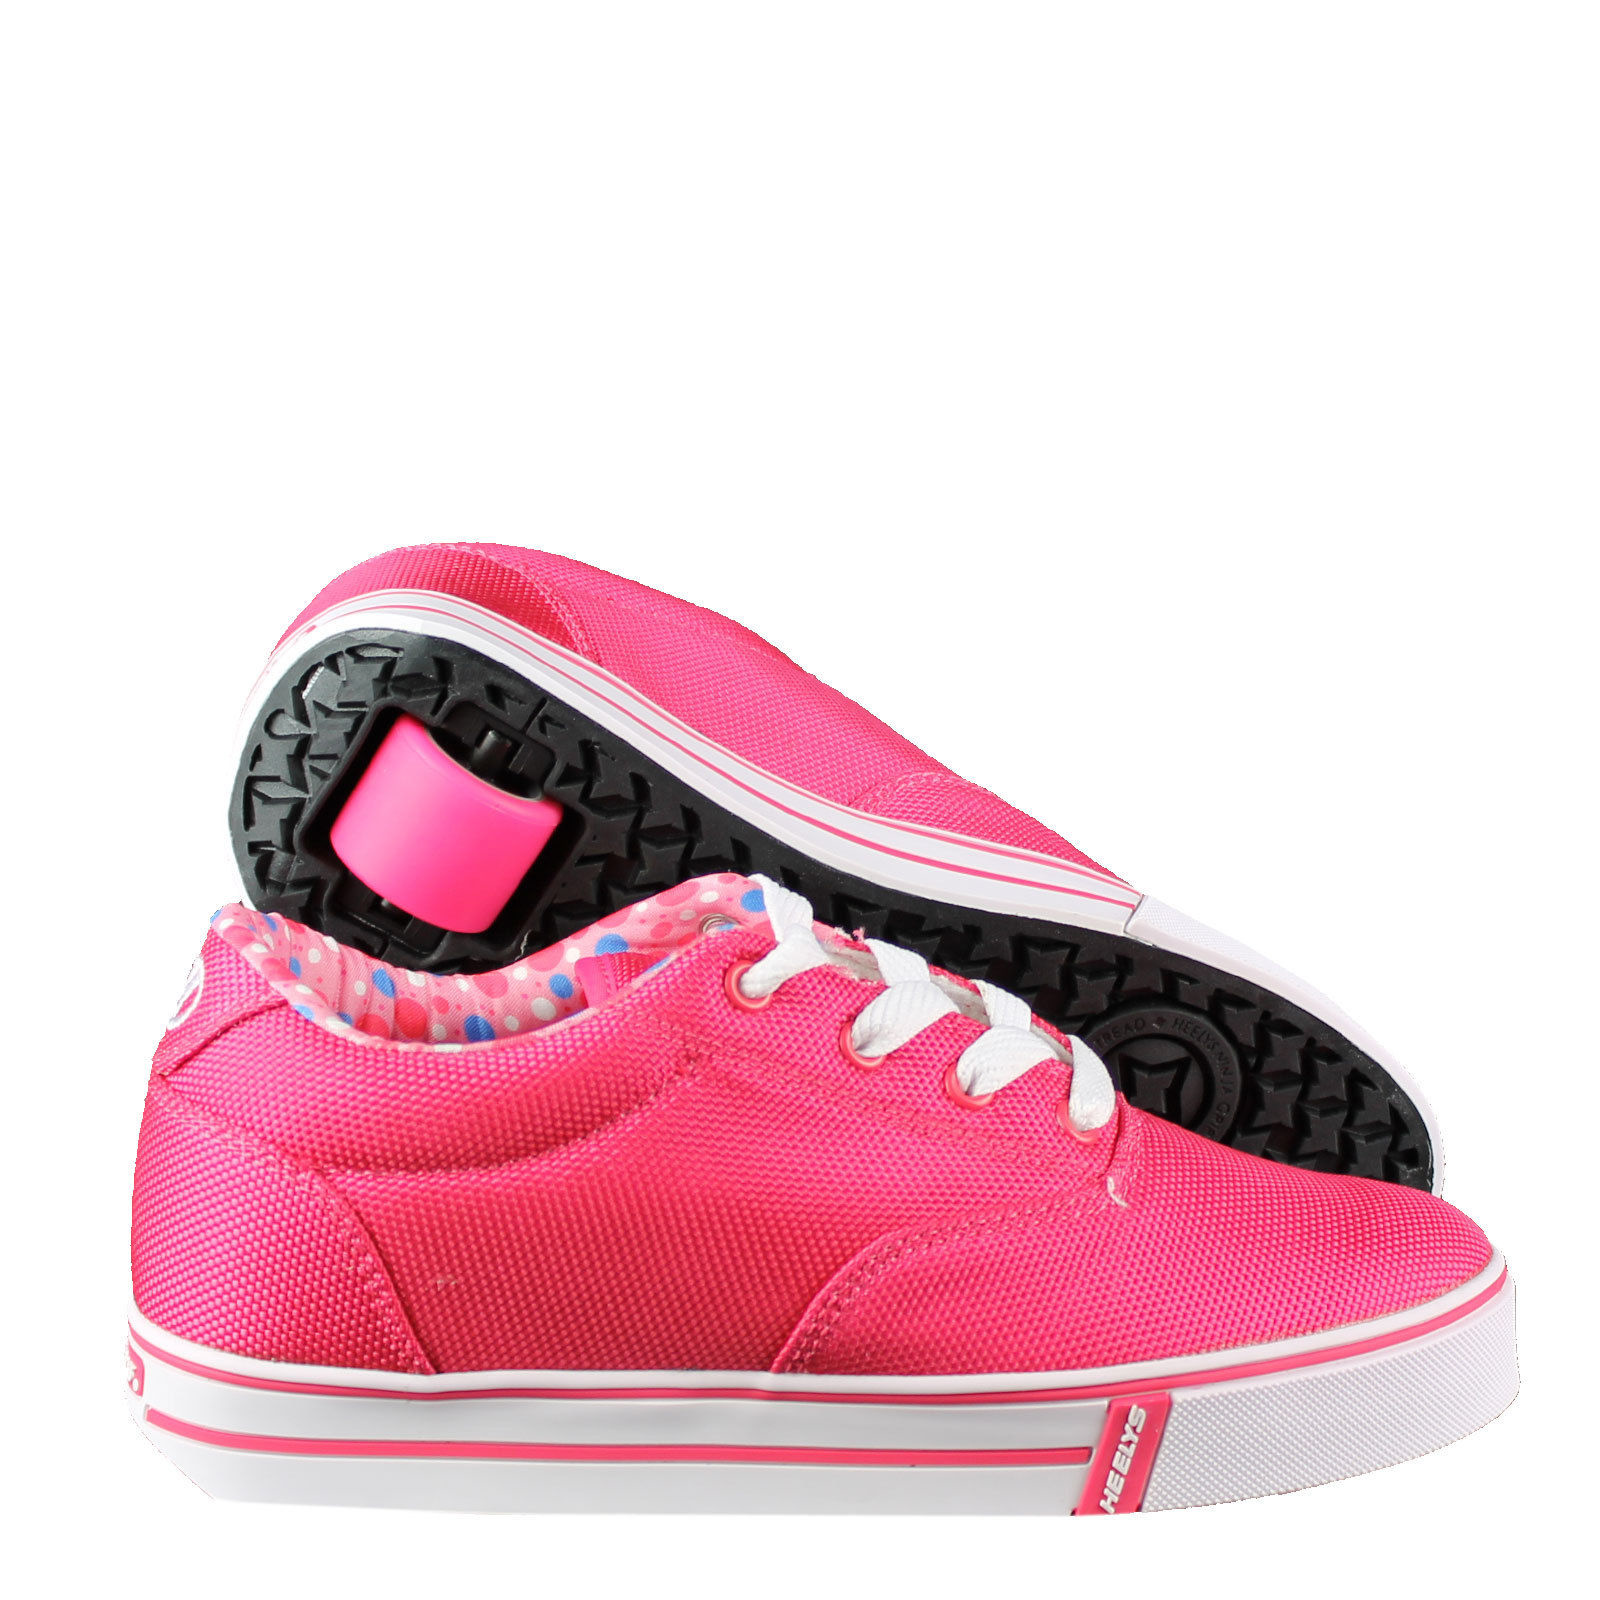 Heely's Heelys Launch Fuchsia Printed Pink